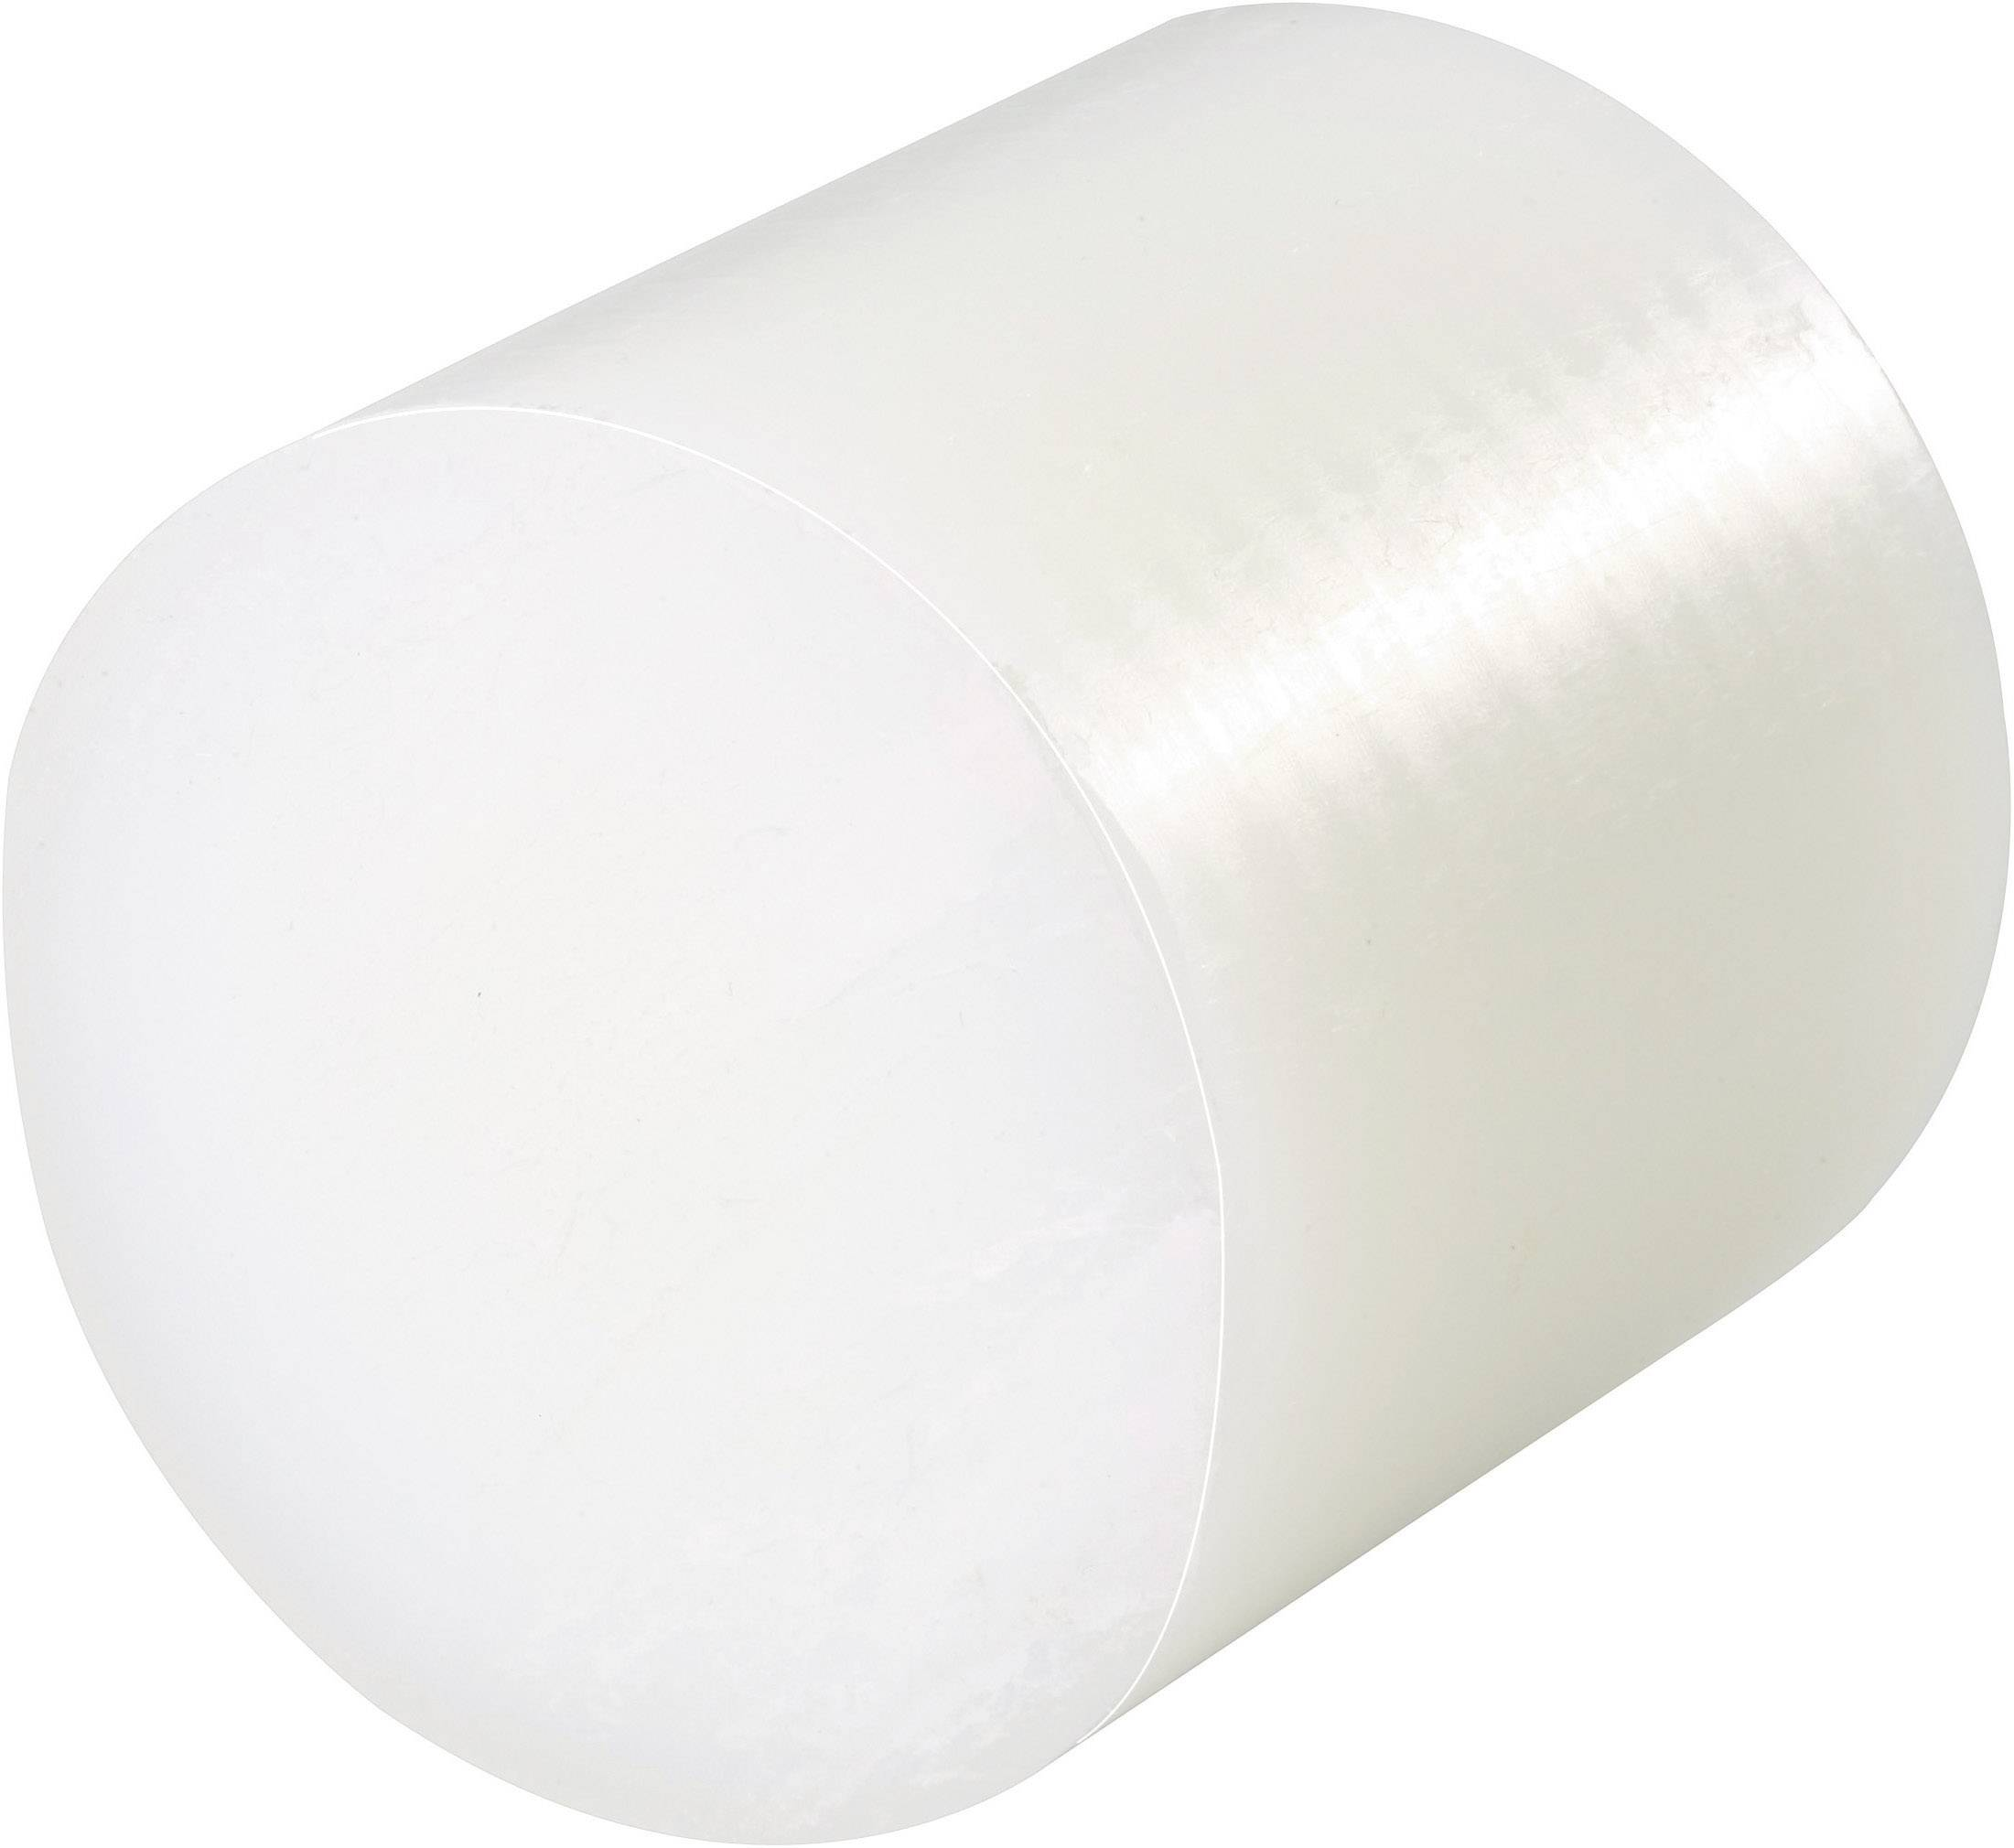 Tyčový profil, (Ø x d) 60 mm x 60 mm, polyamid